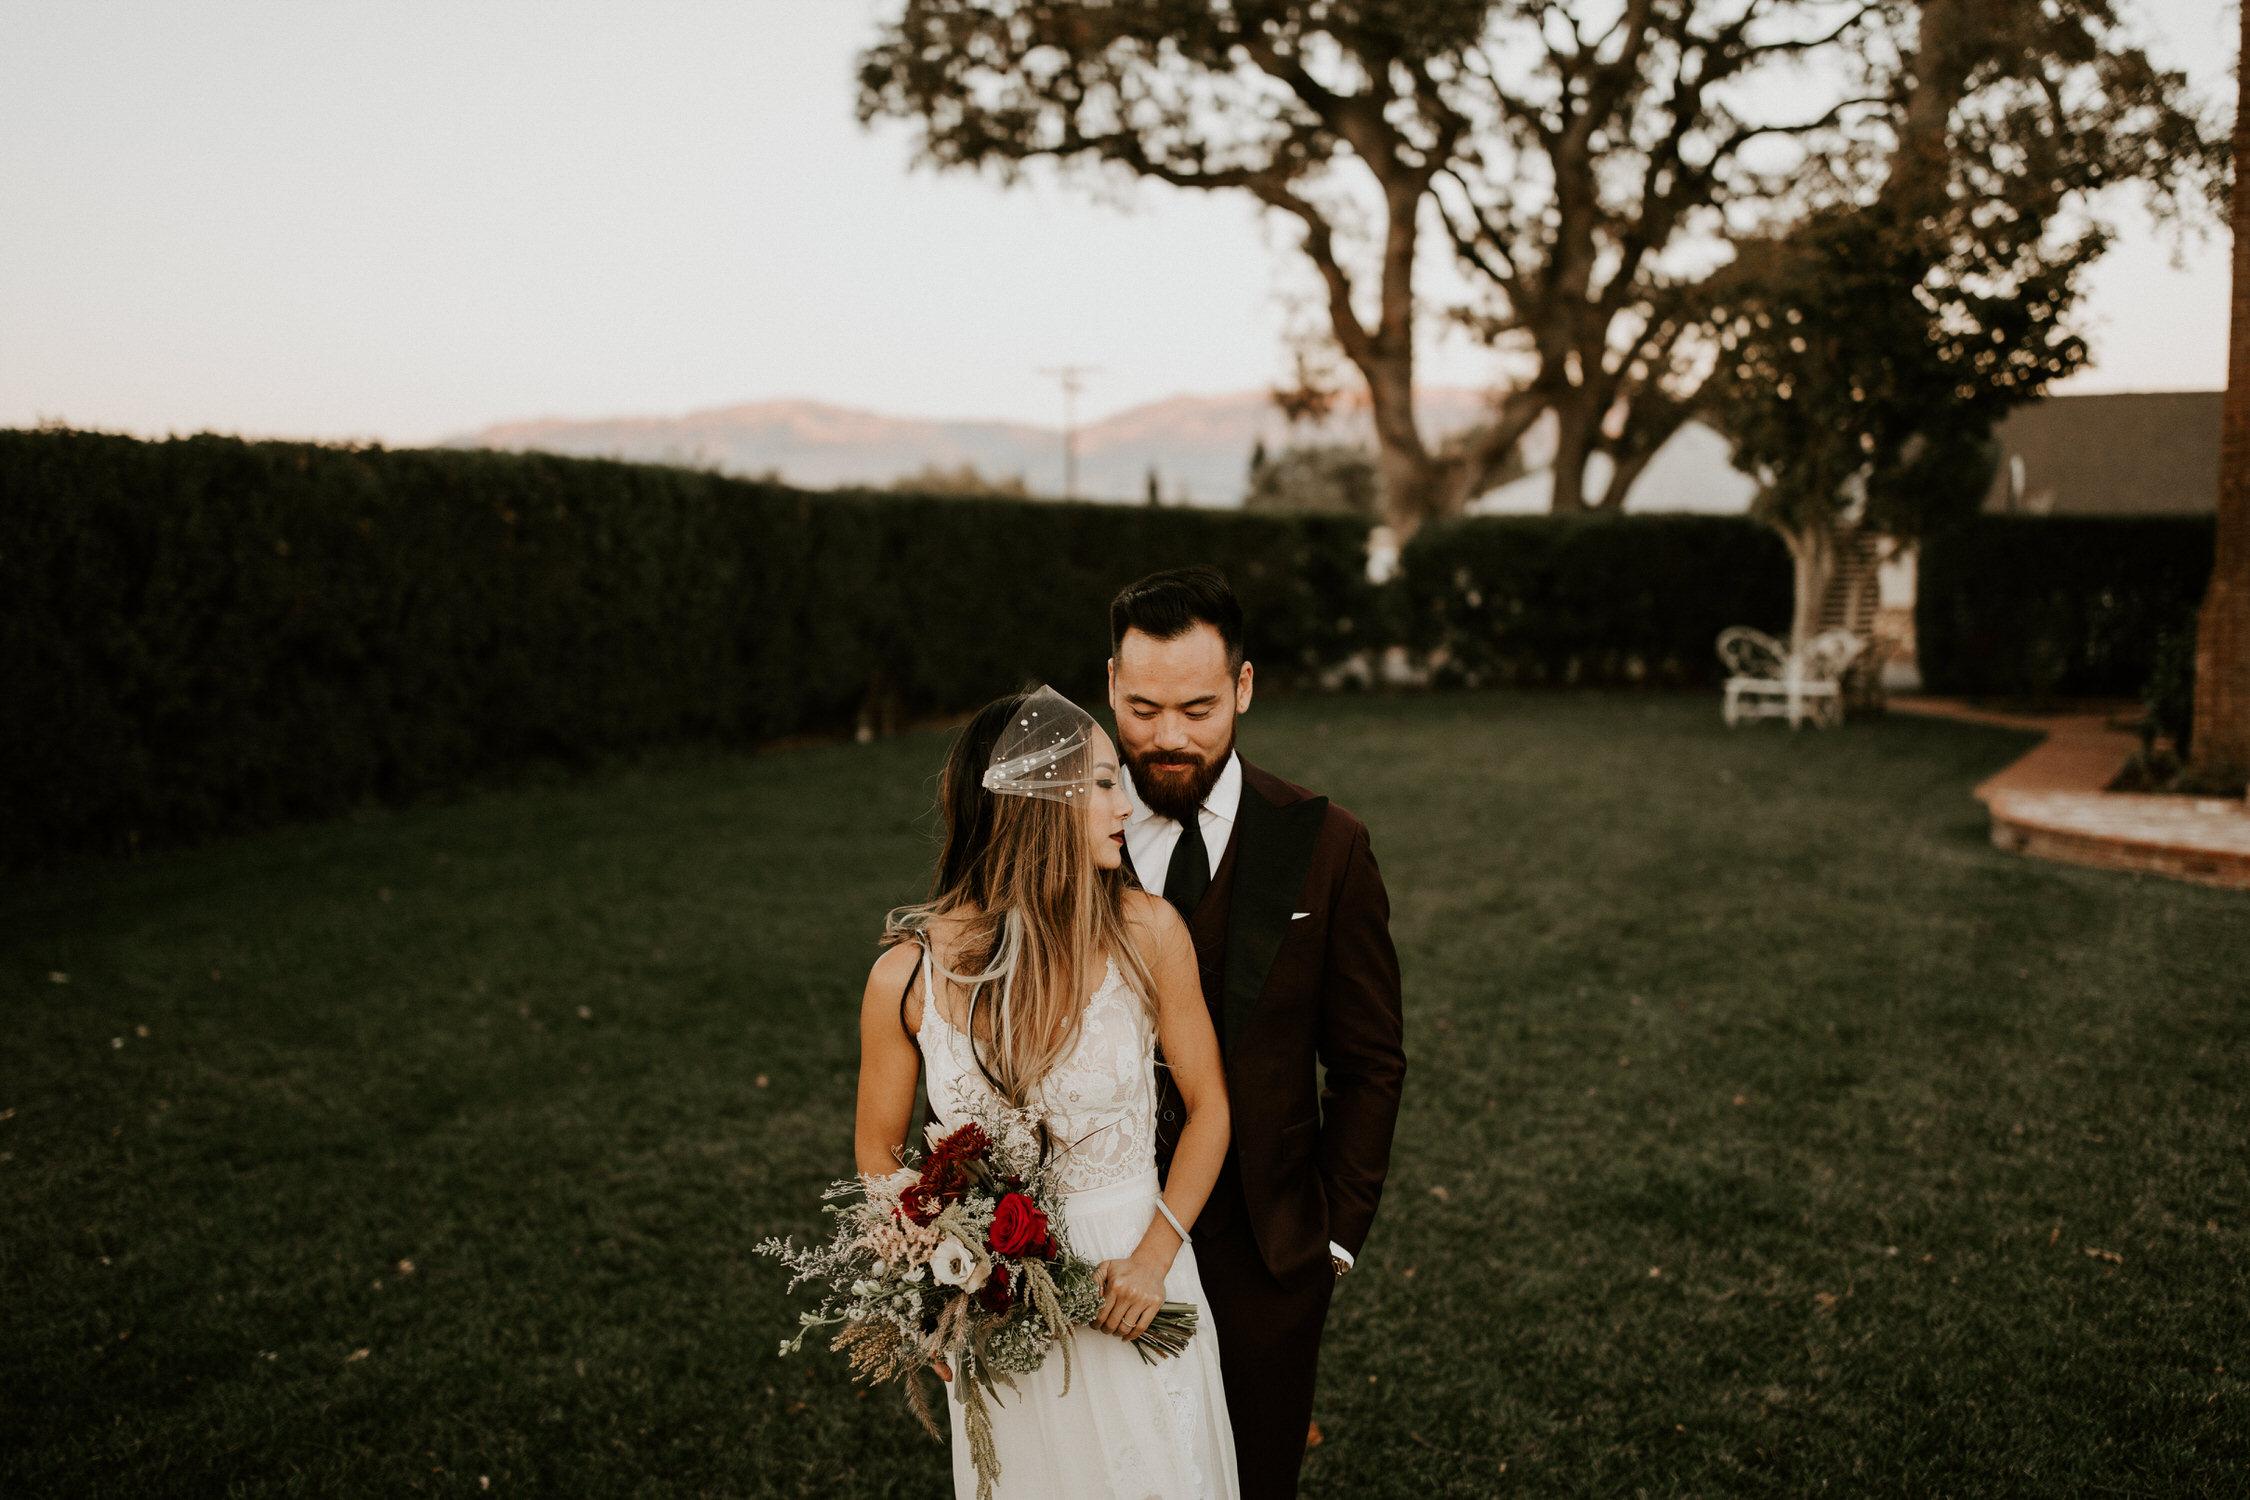 couple-intimate-wedding-northern-california-152.jpg